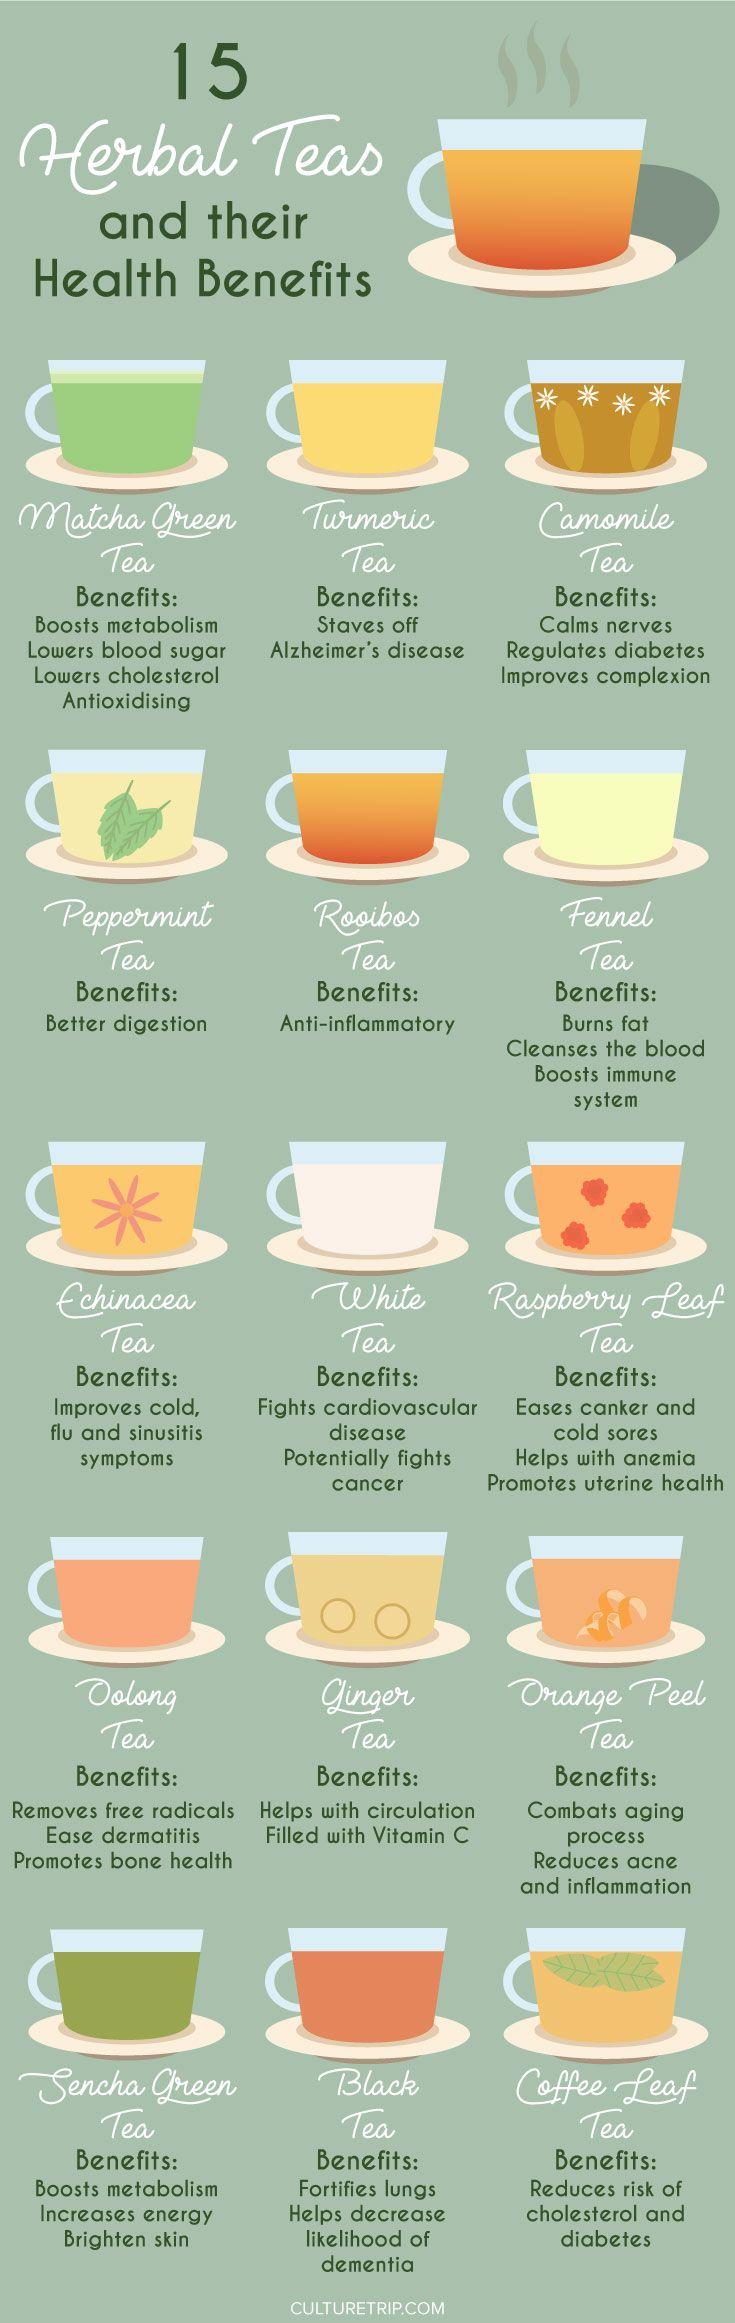 15 Herbal Teas and Their Health Benefits Pinterest: @theculturetrip